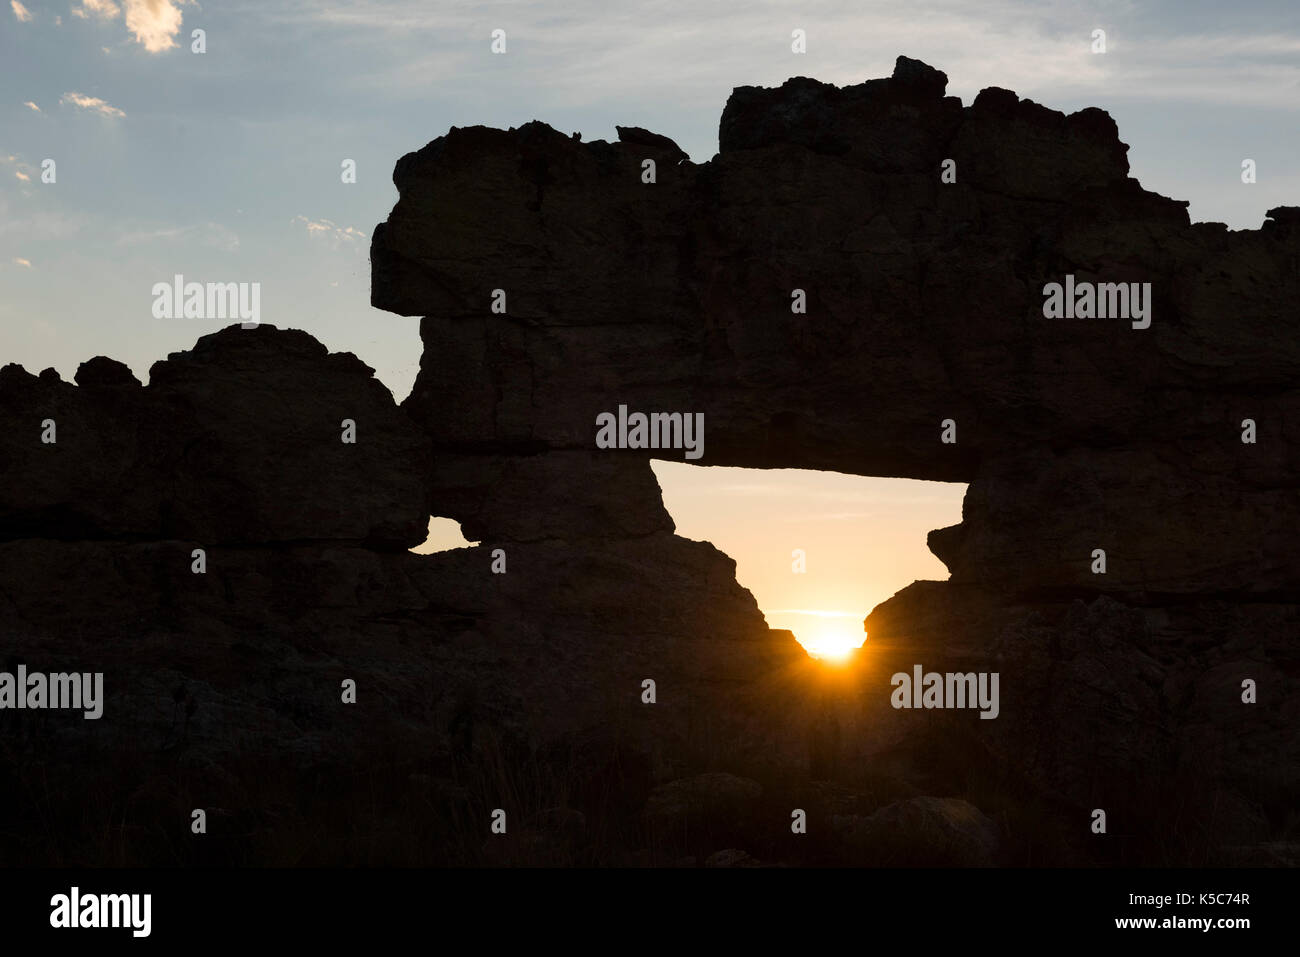 La Fenêtre de l'Isalo or Isalo windo, at sunset, Isalo National Park, Madagascar Stock Photo